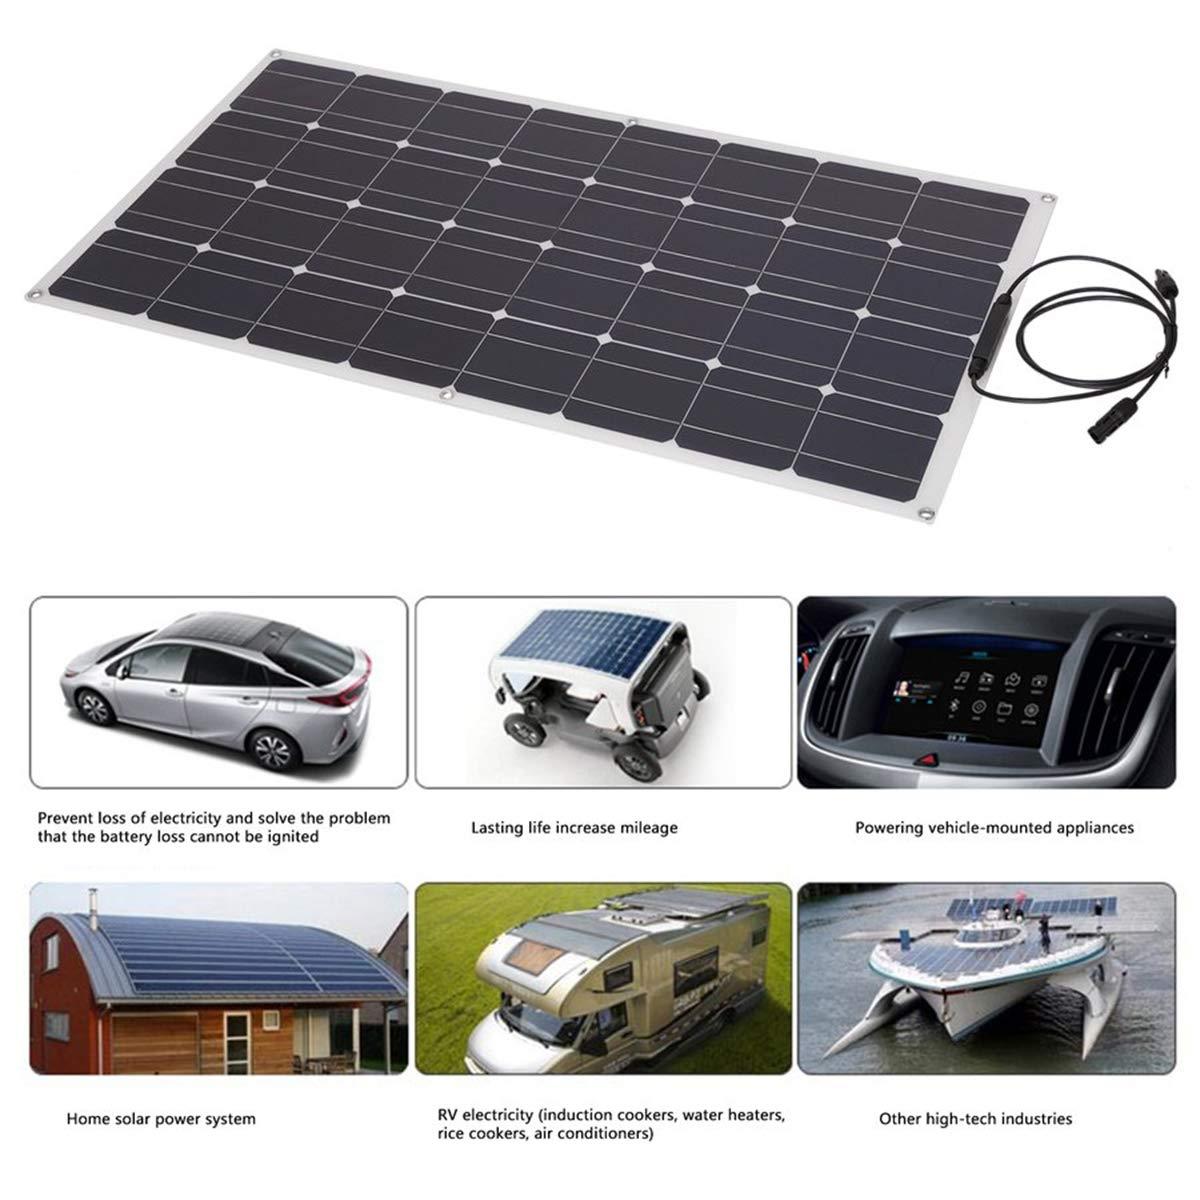 Holarose 100W Monocrystalline Flexible Solar Panel, Waterproof Flexible  Monocrystalline Lightweight Solar Power System for RV, Boats, Roofs, Cabin,